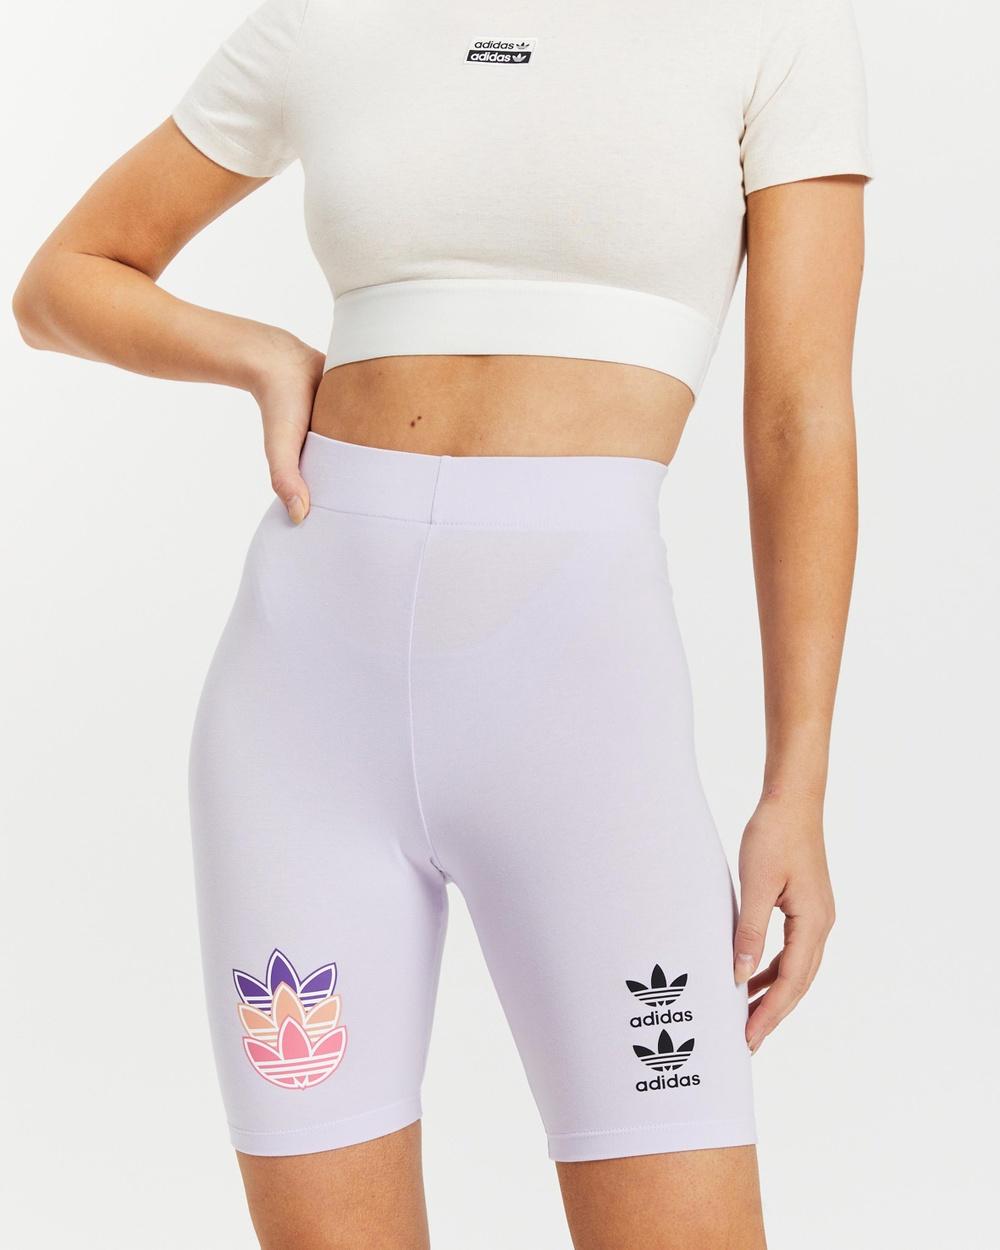 adidas Originals Logo Play Short Tights High-Waisted Purple Tint